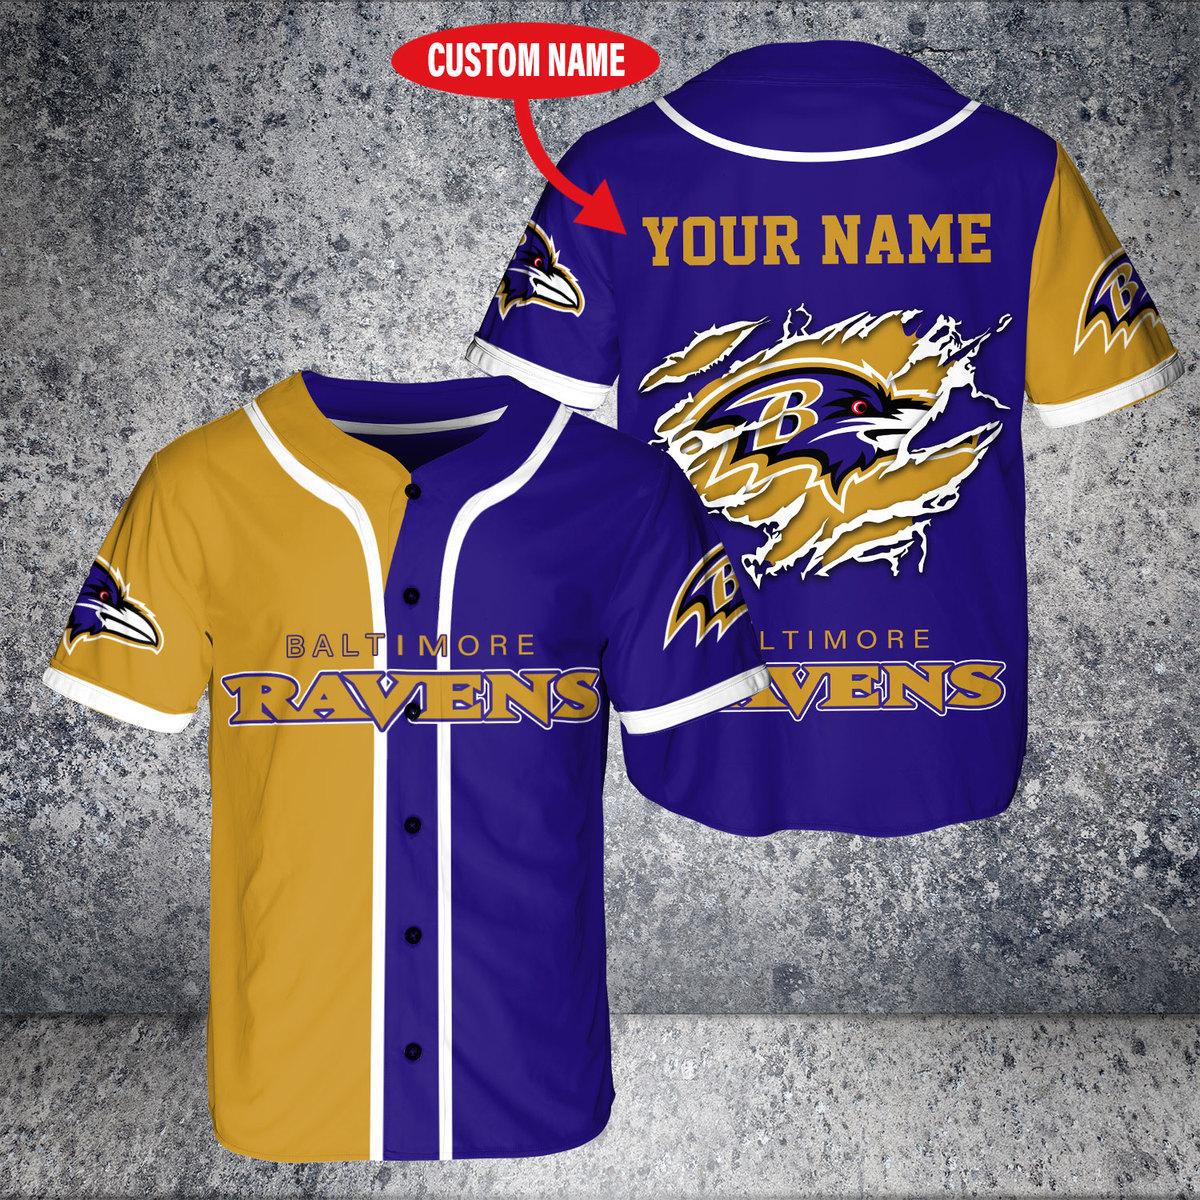 Custom Name NFL Baltimore Ravens Baseball Jersey Shirt